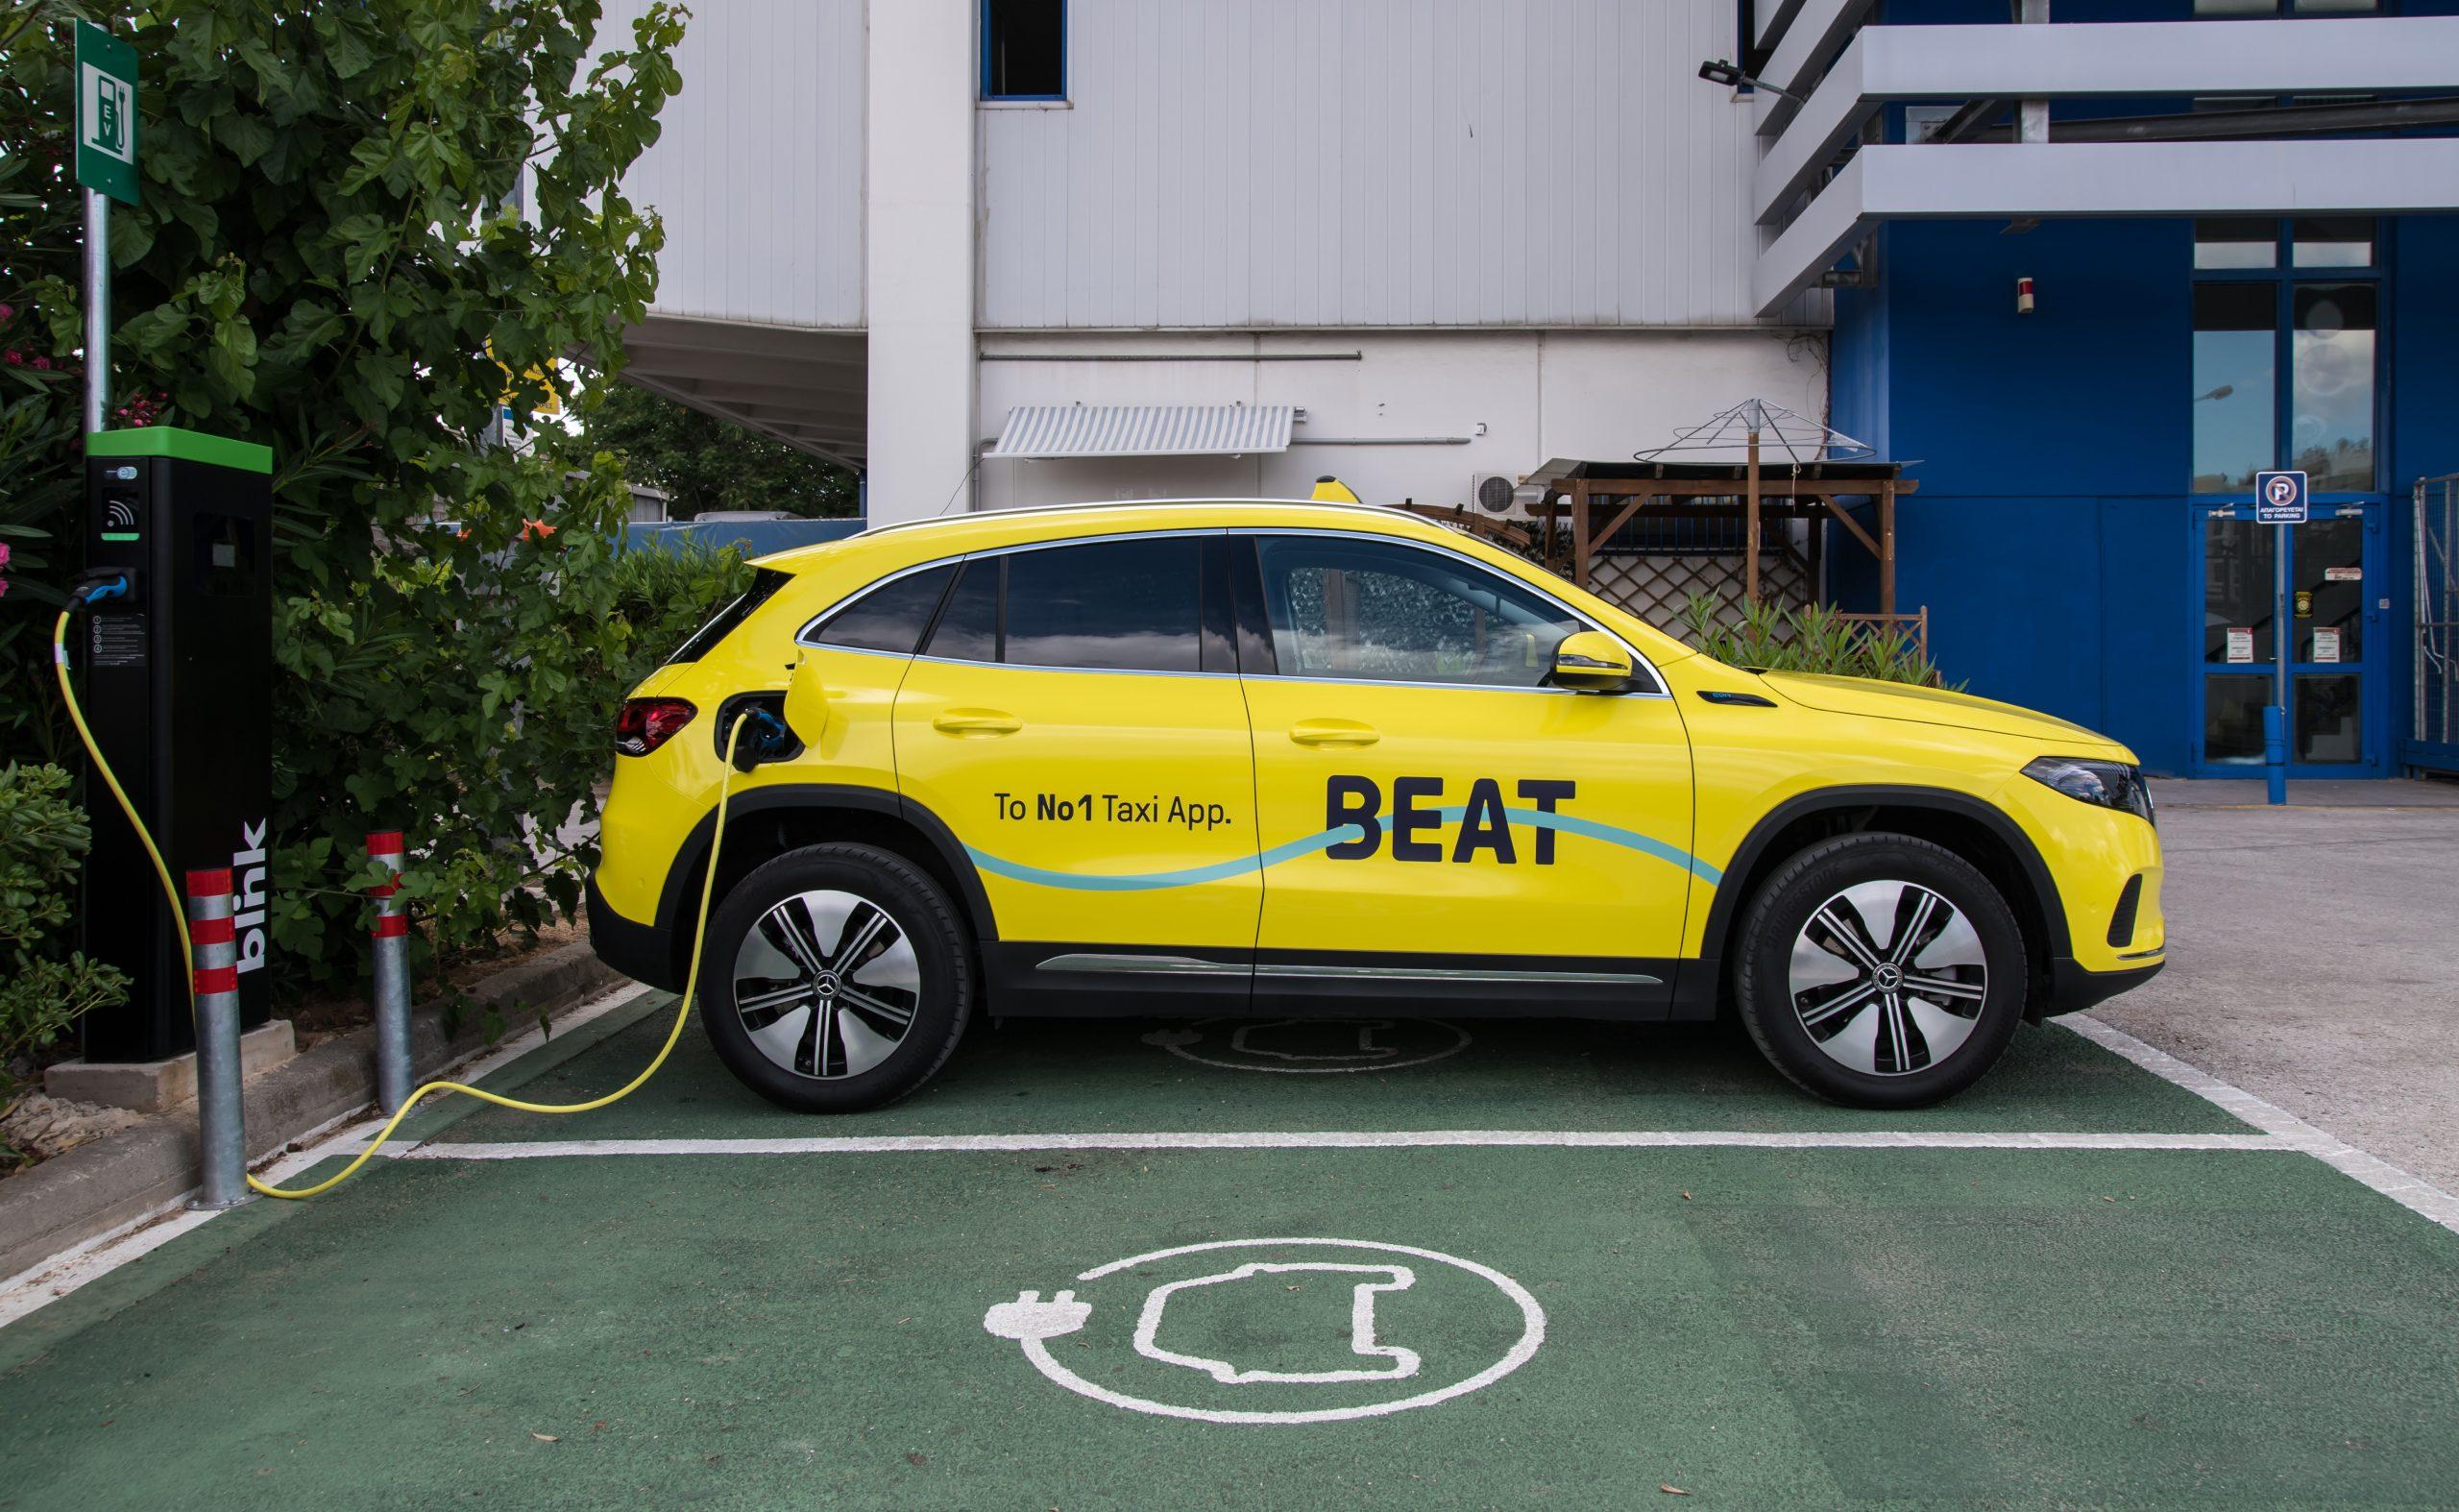 BEAT 0088 scaled ΒΕΑΤ : Μηδενικό αποτύπωμα ρύπων έως το 2025 BEAT, Electric cars, electric vehicles, ειδήσεις, ηλεκτρικά, ηλεκτροκινηση, κινουμαι ηλεκτρικα, Νέα, ταξί